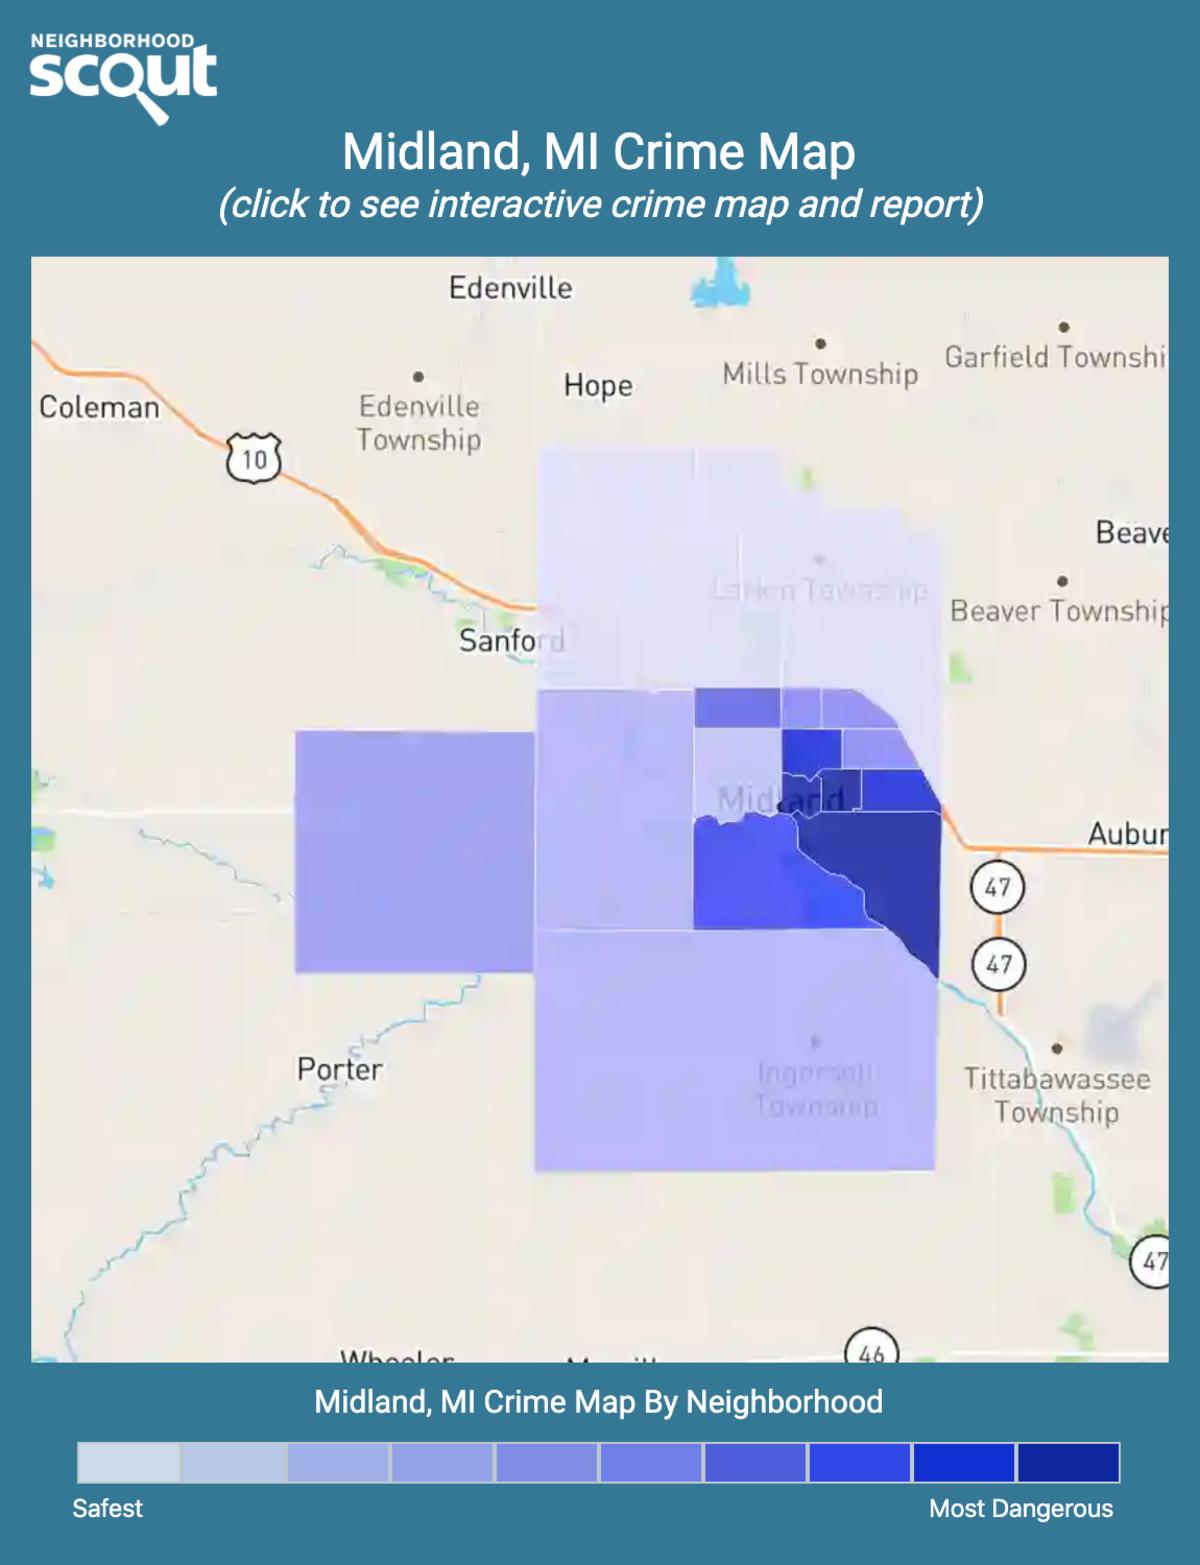 Midland, Michigan crime map